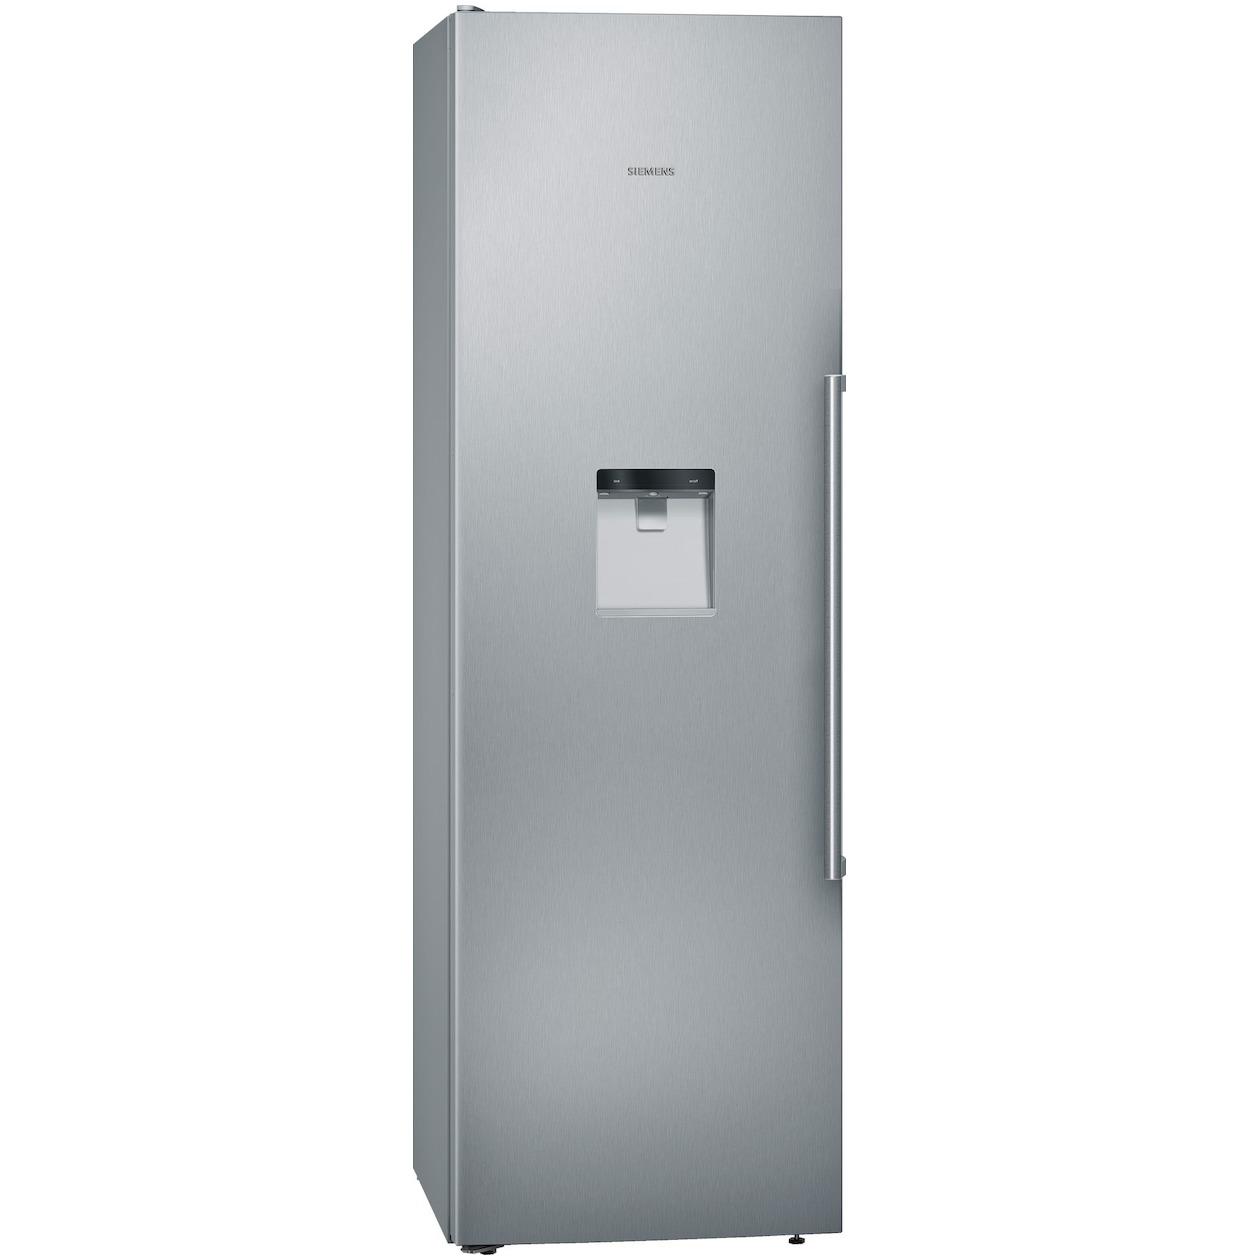 Siemens koelkast zonder vriesvak KS36WBI3P rvs - Prijsvergelijk